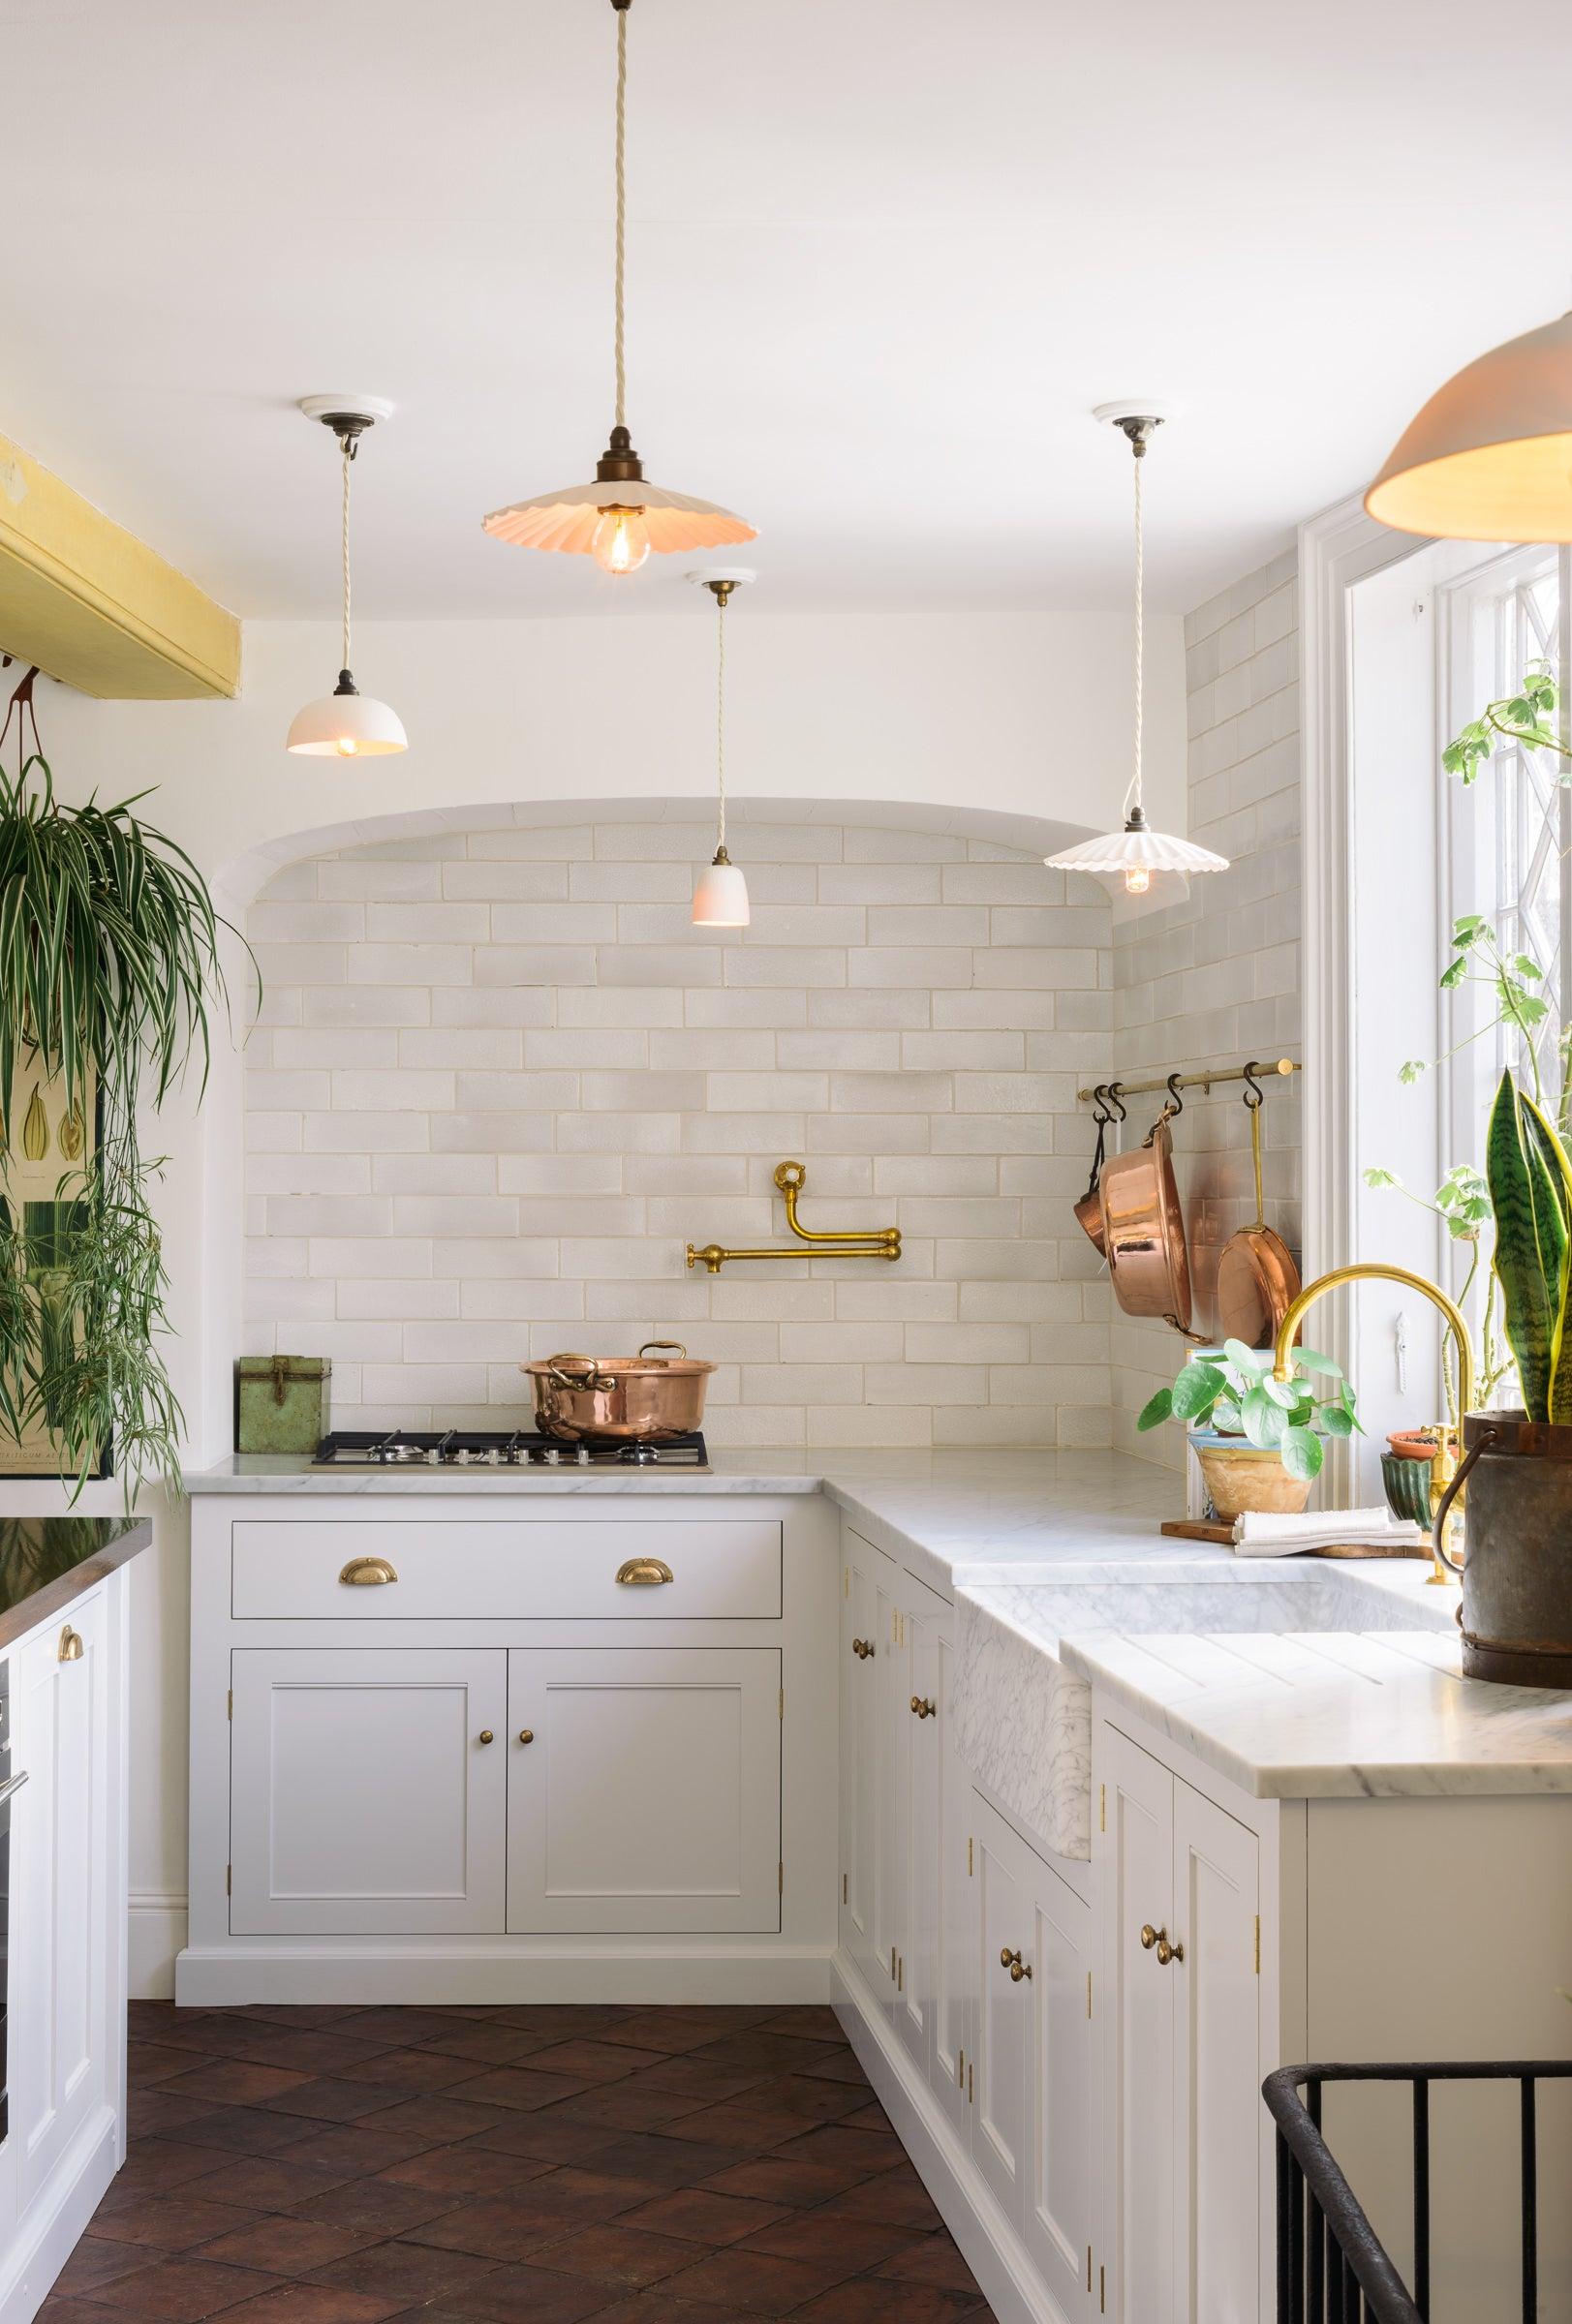 White kitchen with terracotta floors